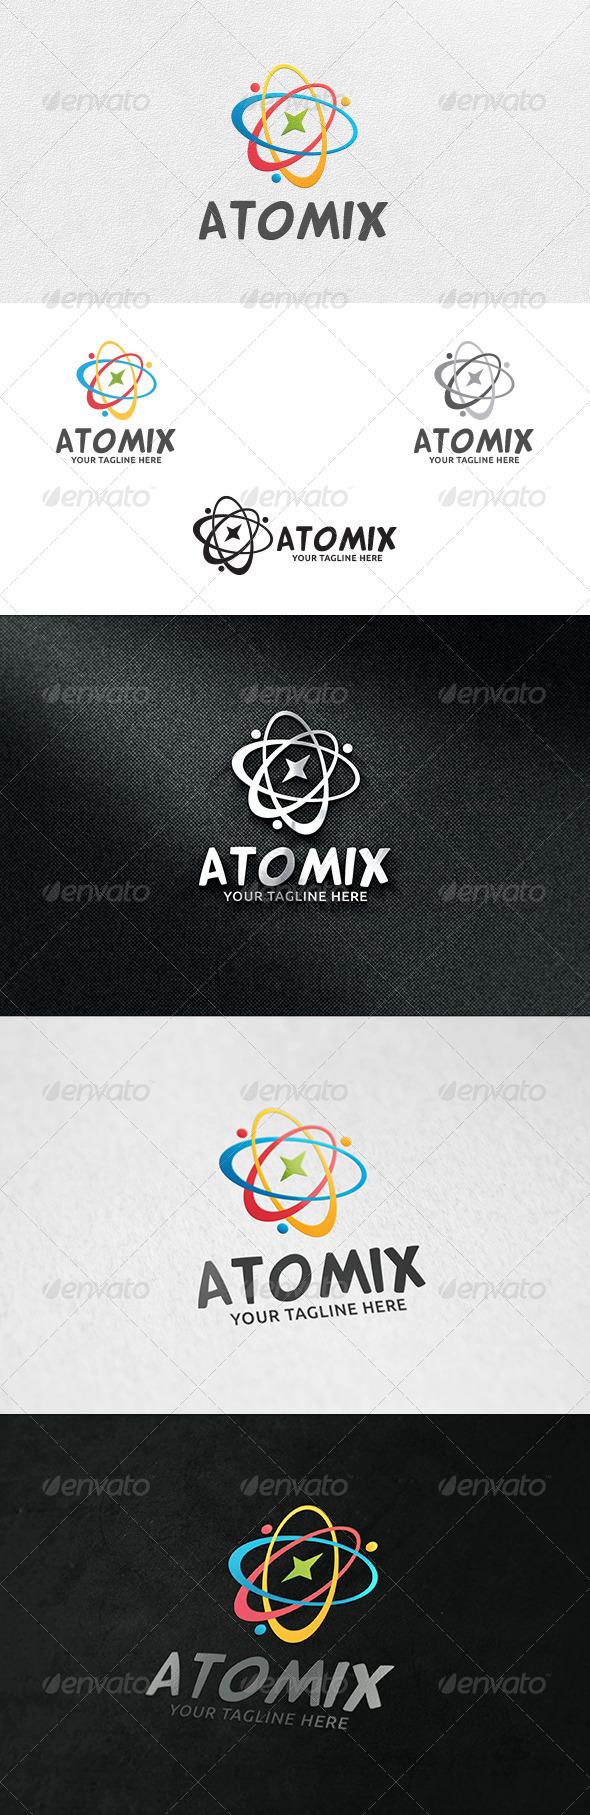 Atomix - Logo Template  - Symbols Logo Templates